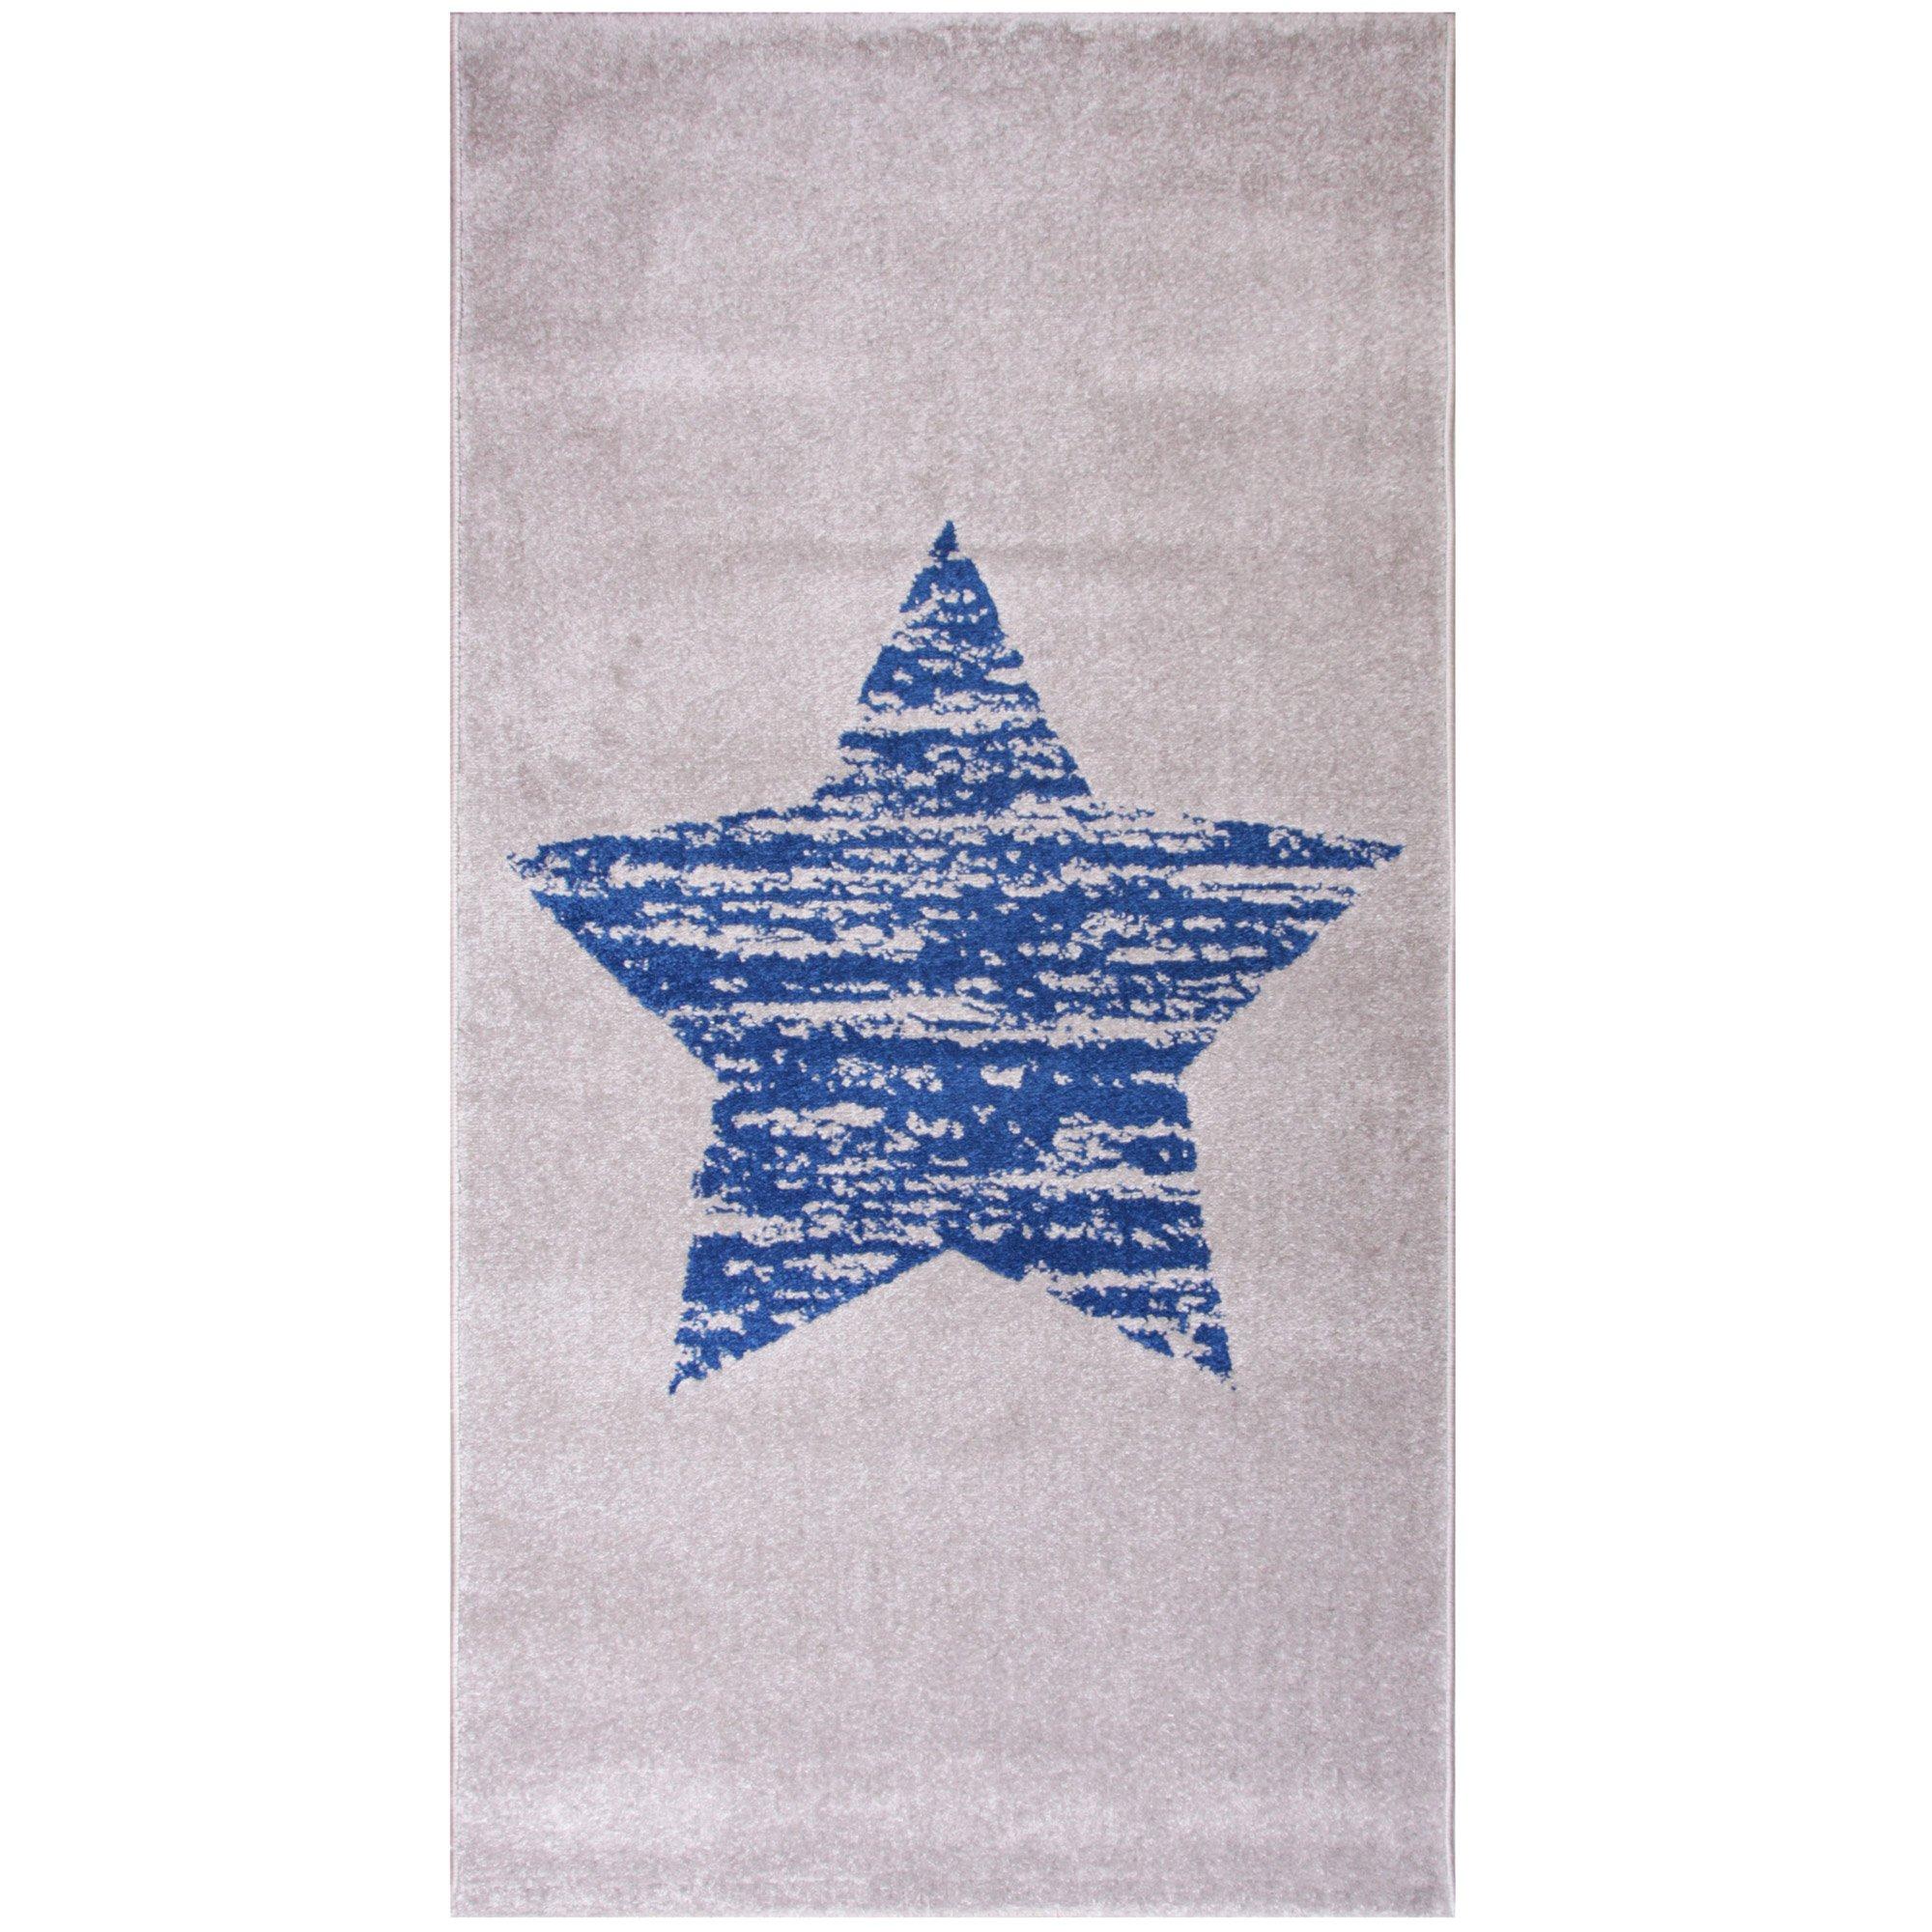 Tapis Lucero 80x150 cm Bleu de Nattiot, Tapis : Aubert